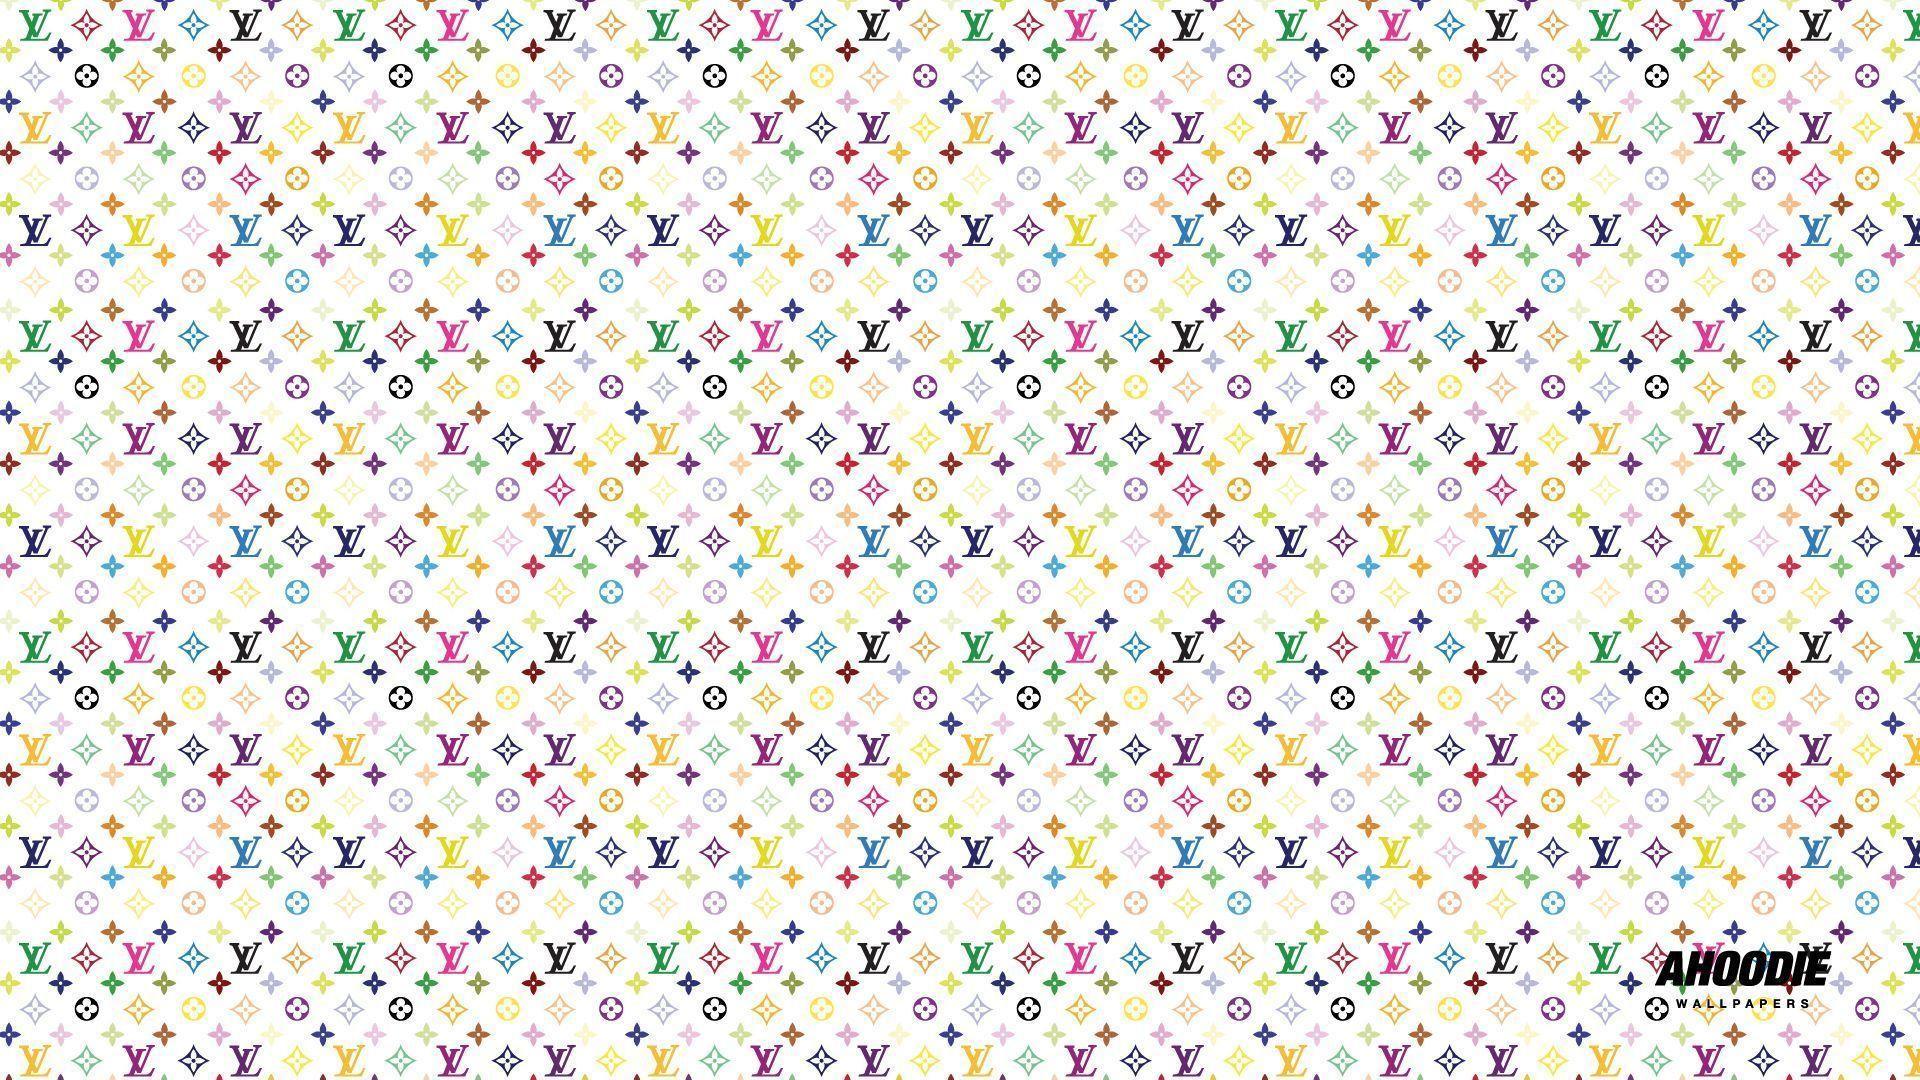 Louis Vuitton Wallpapers Rainbow